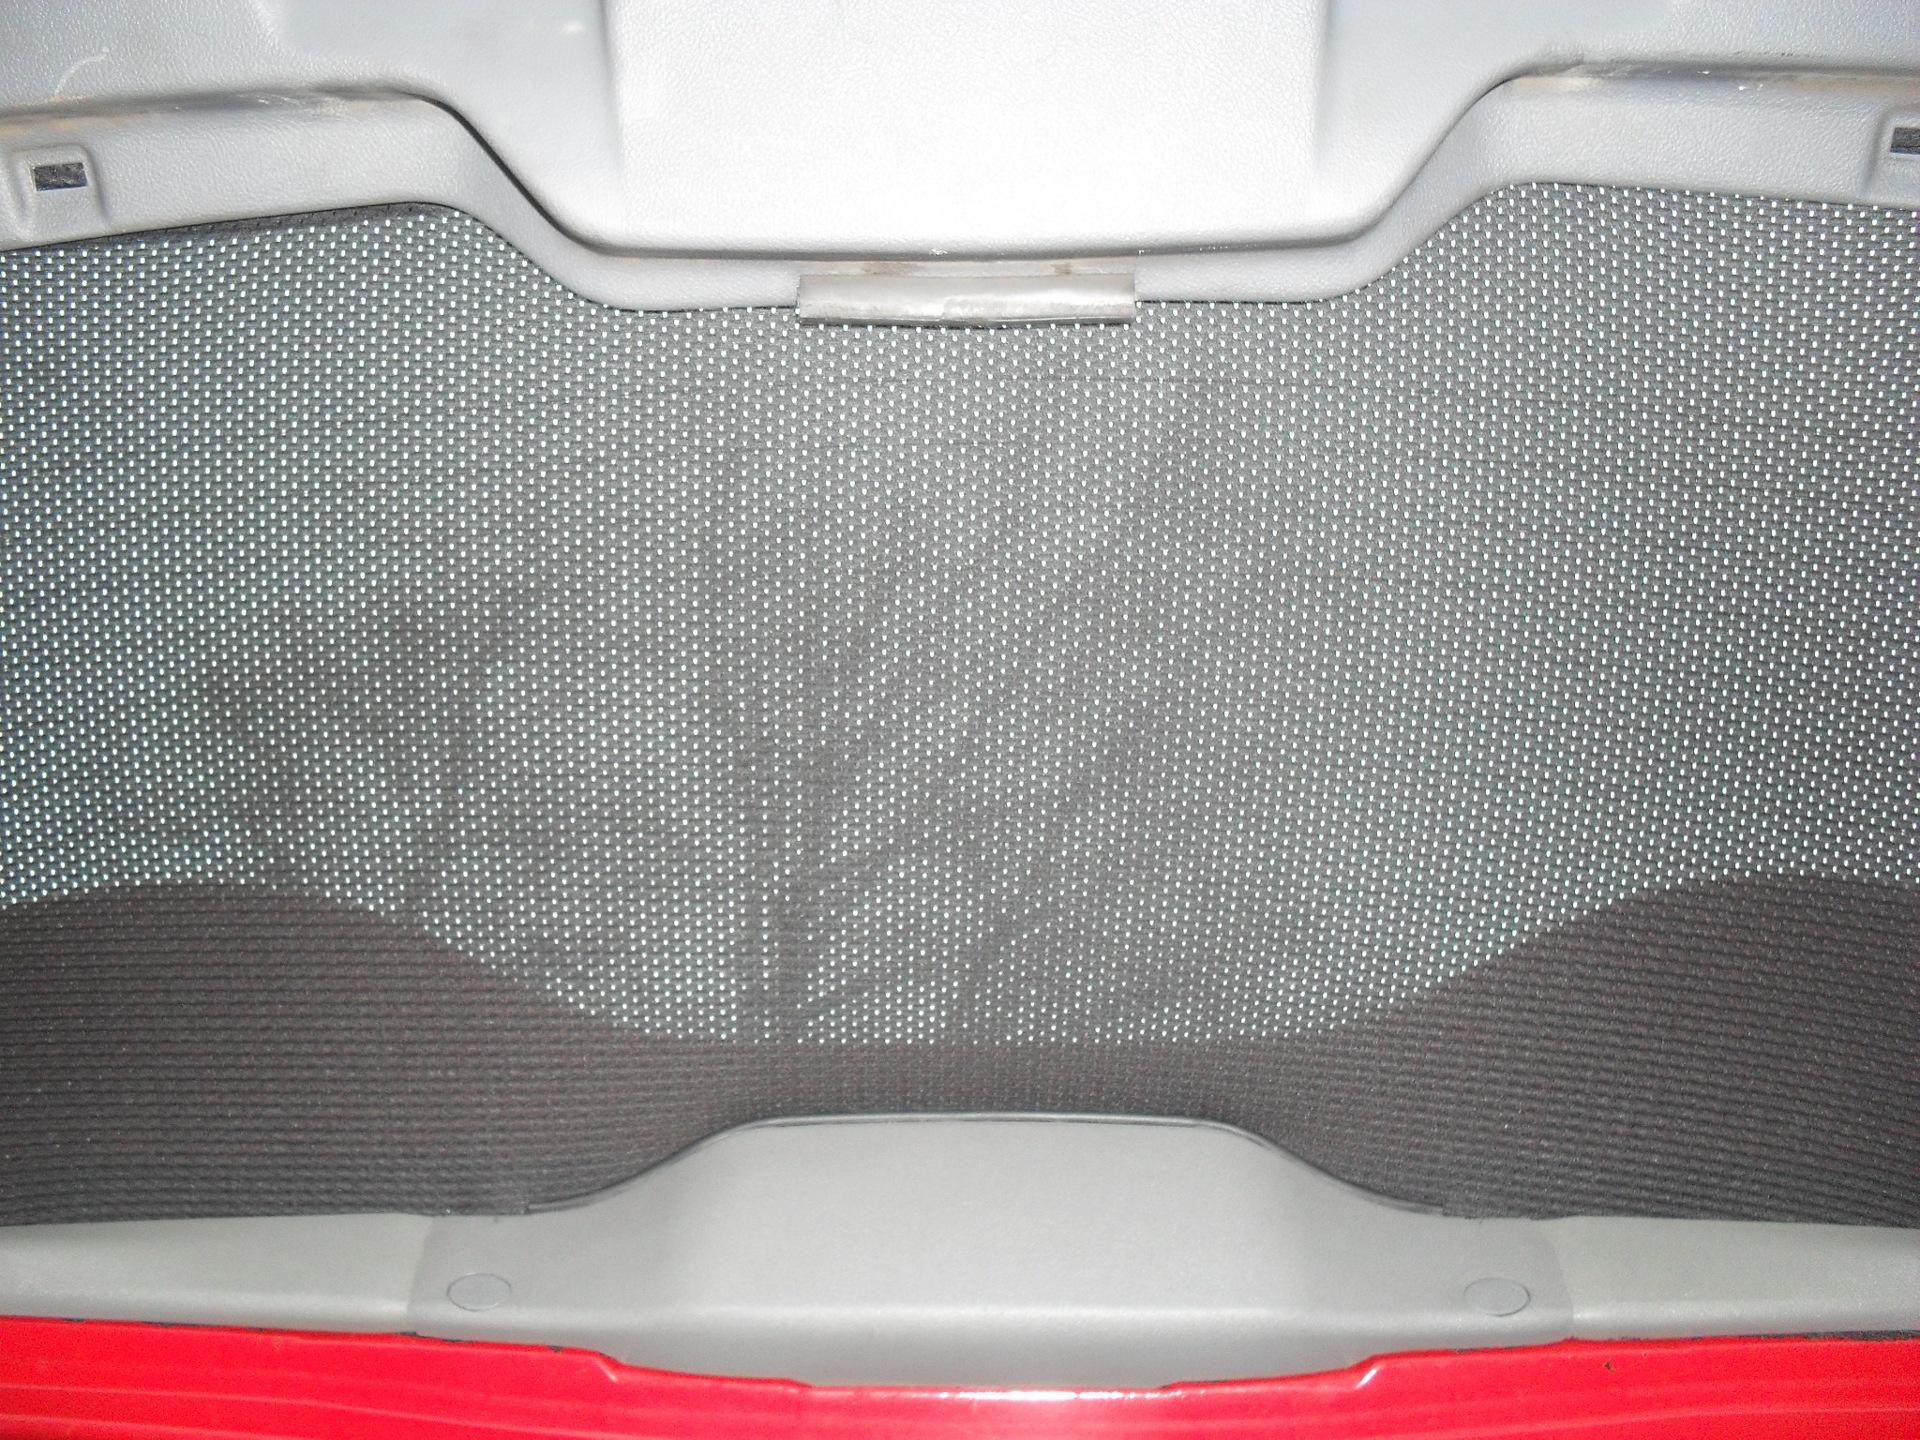 Пошив шторок для автомобиля своими руками